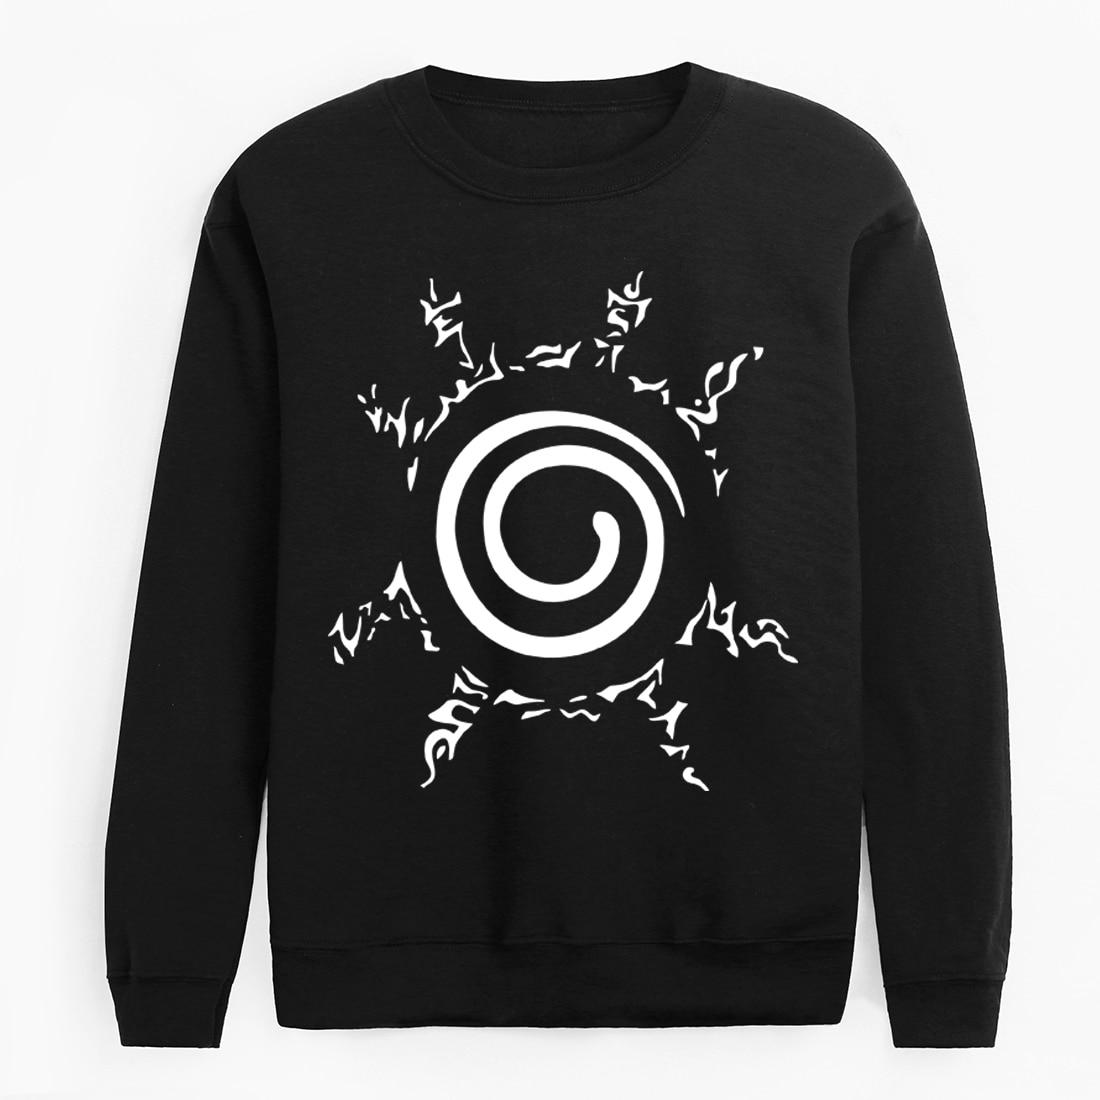 2020 Funny Naruto Print Pullovers Autumn Winter Hoodies Sweatshirt Harajuku Hip Hop Fleece Brand Clothing Men Fashion Tracksuits